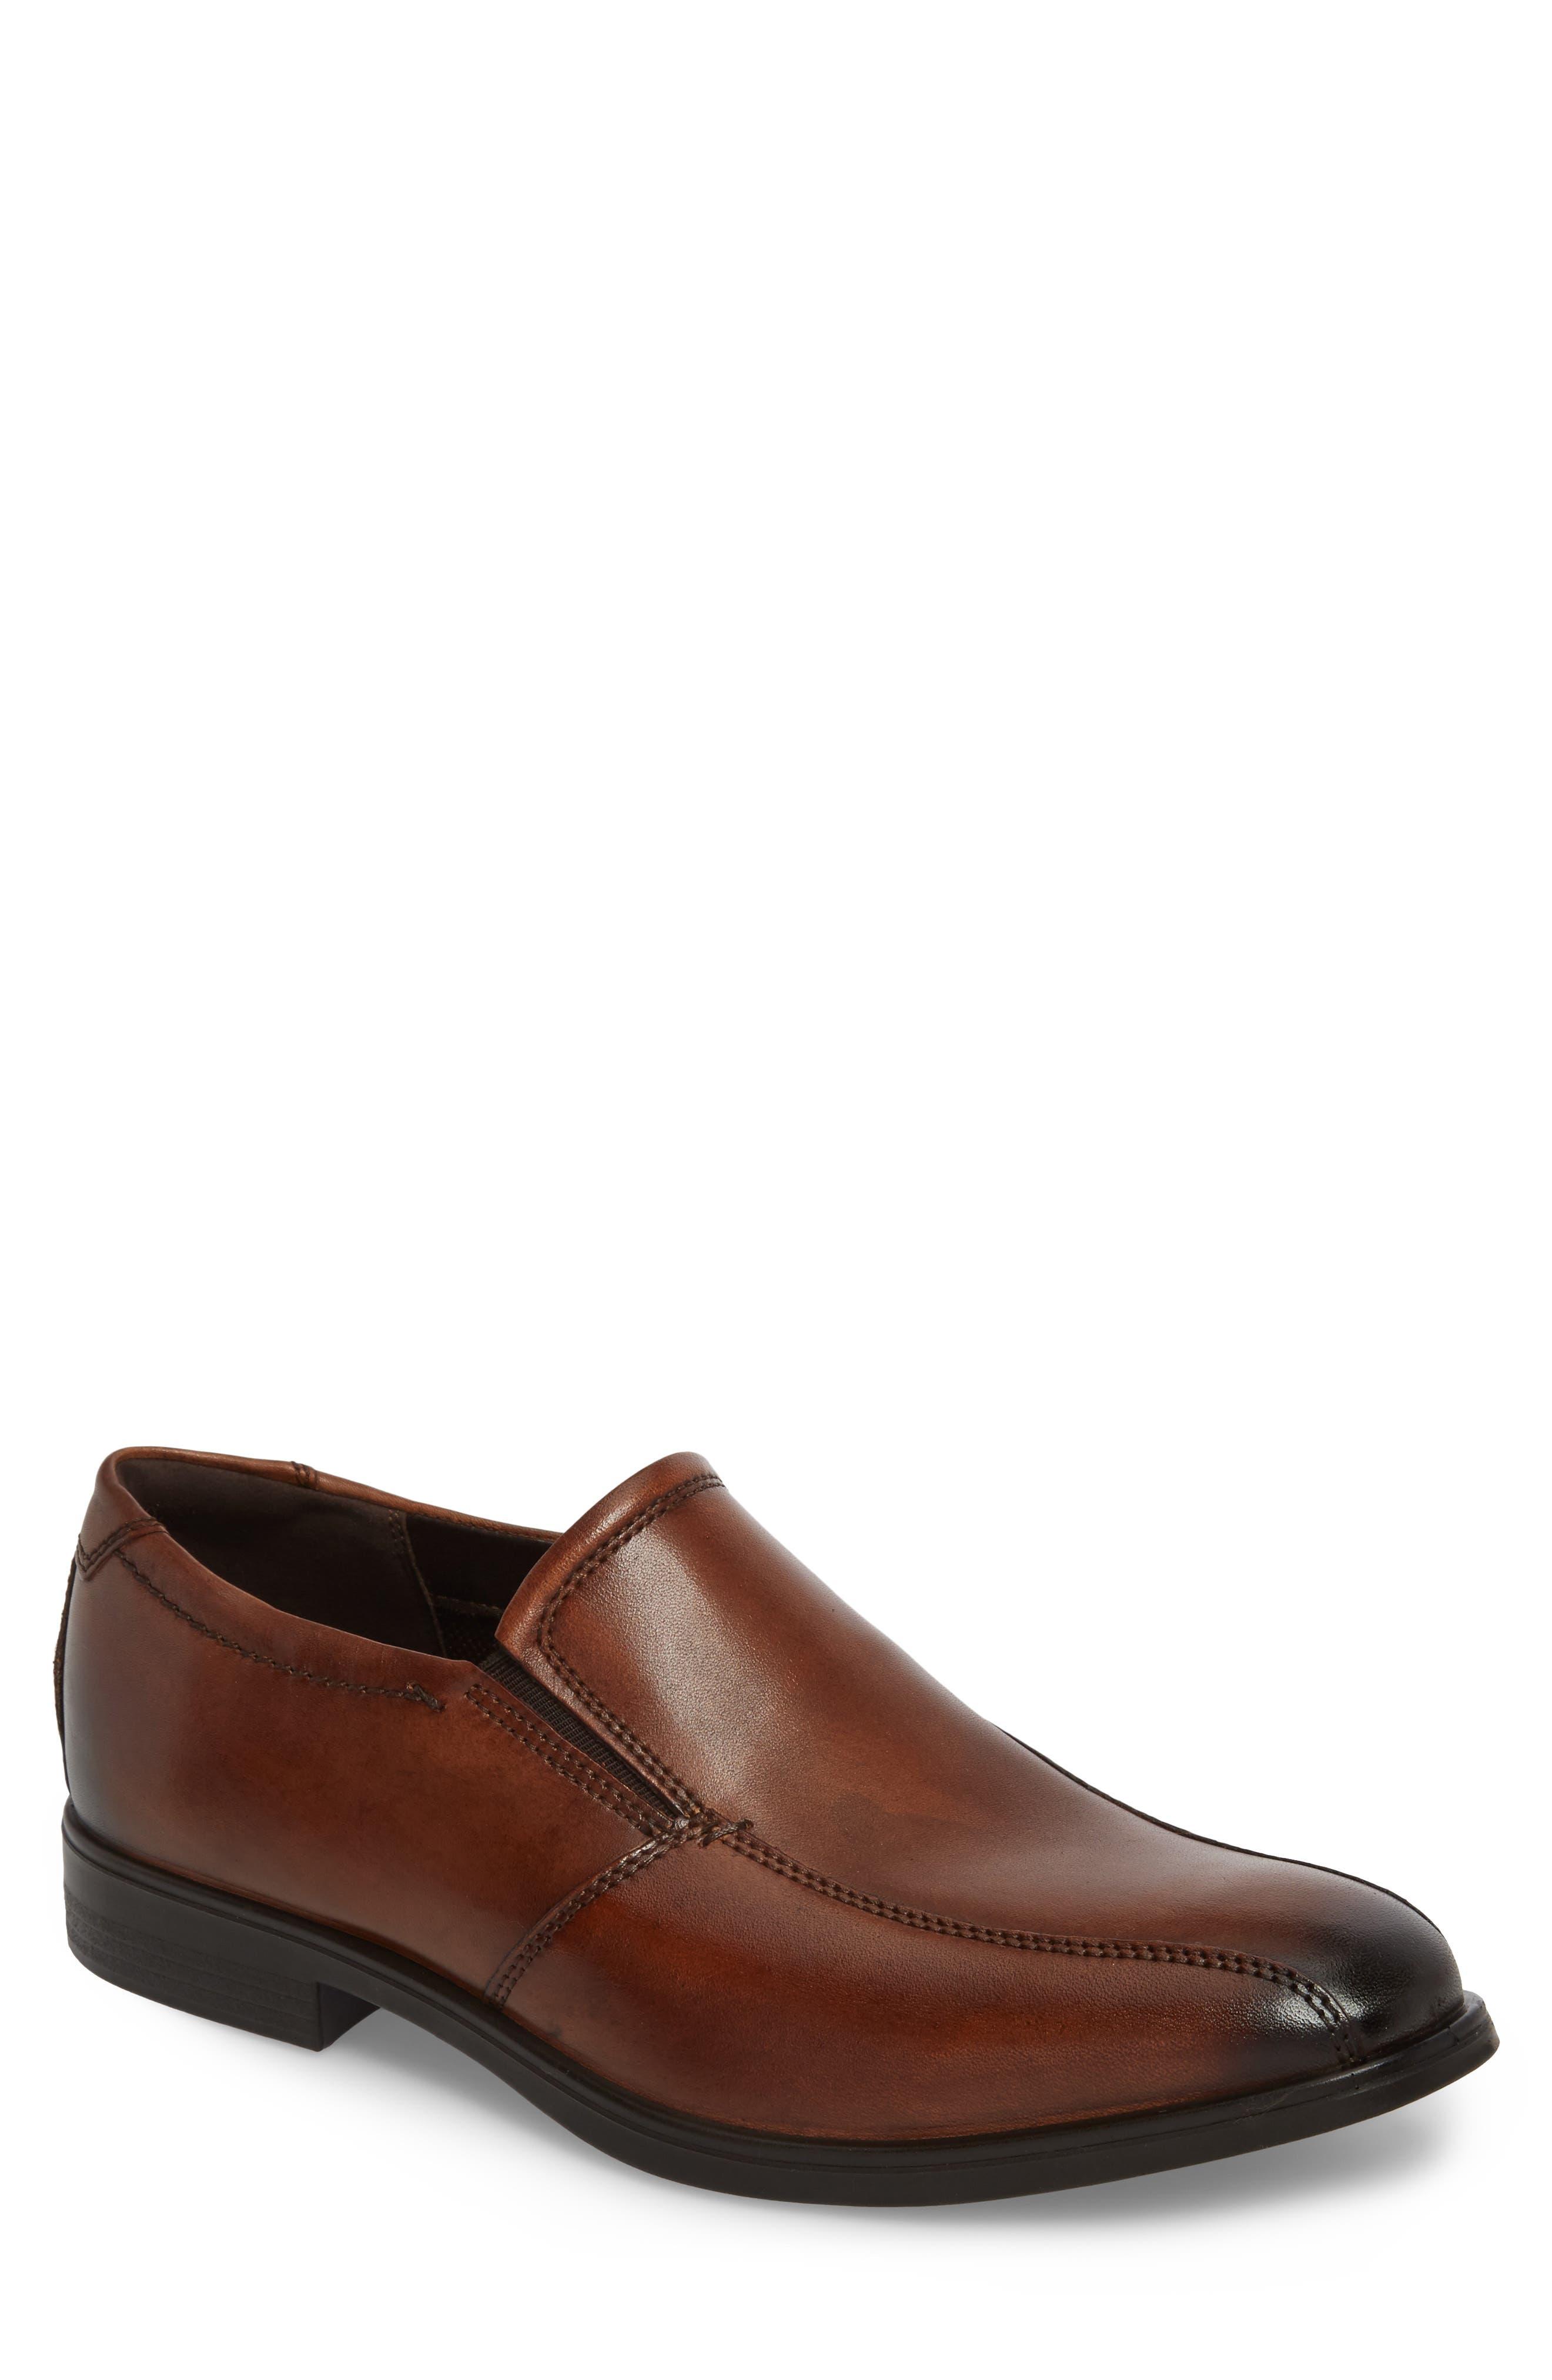 Melbourne Venetian Loafer,                         Main,                         color, Amber Leather